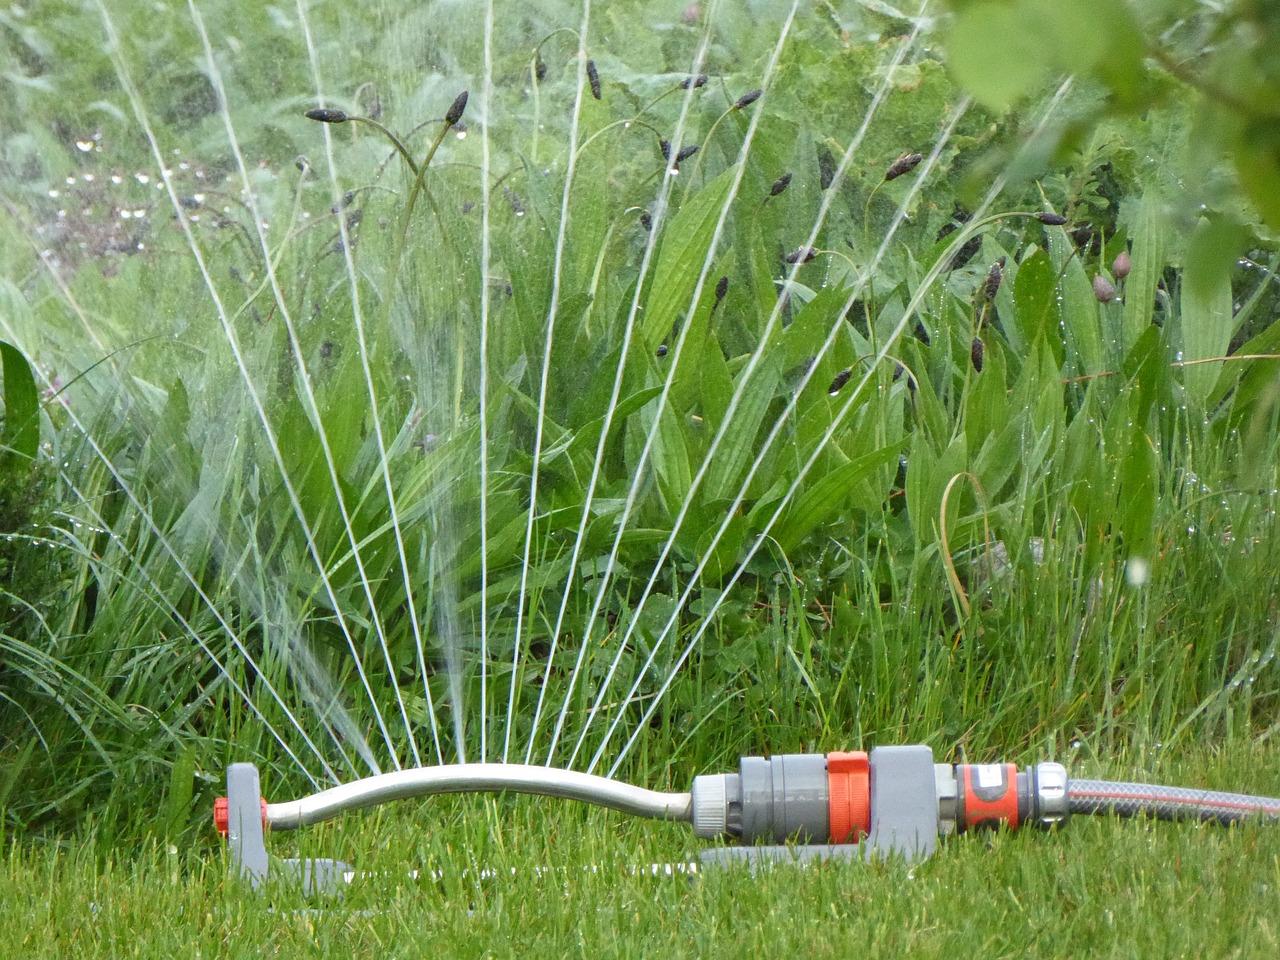 Rush Water Casting Drop Of Water  - EME / Pixabay